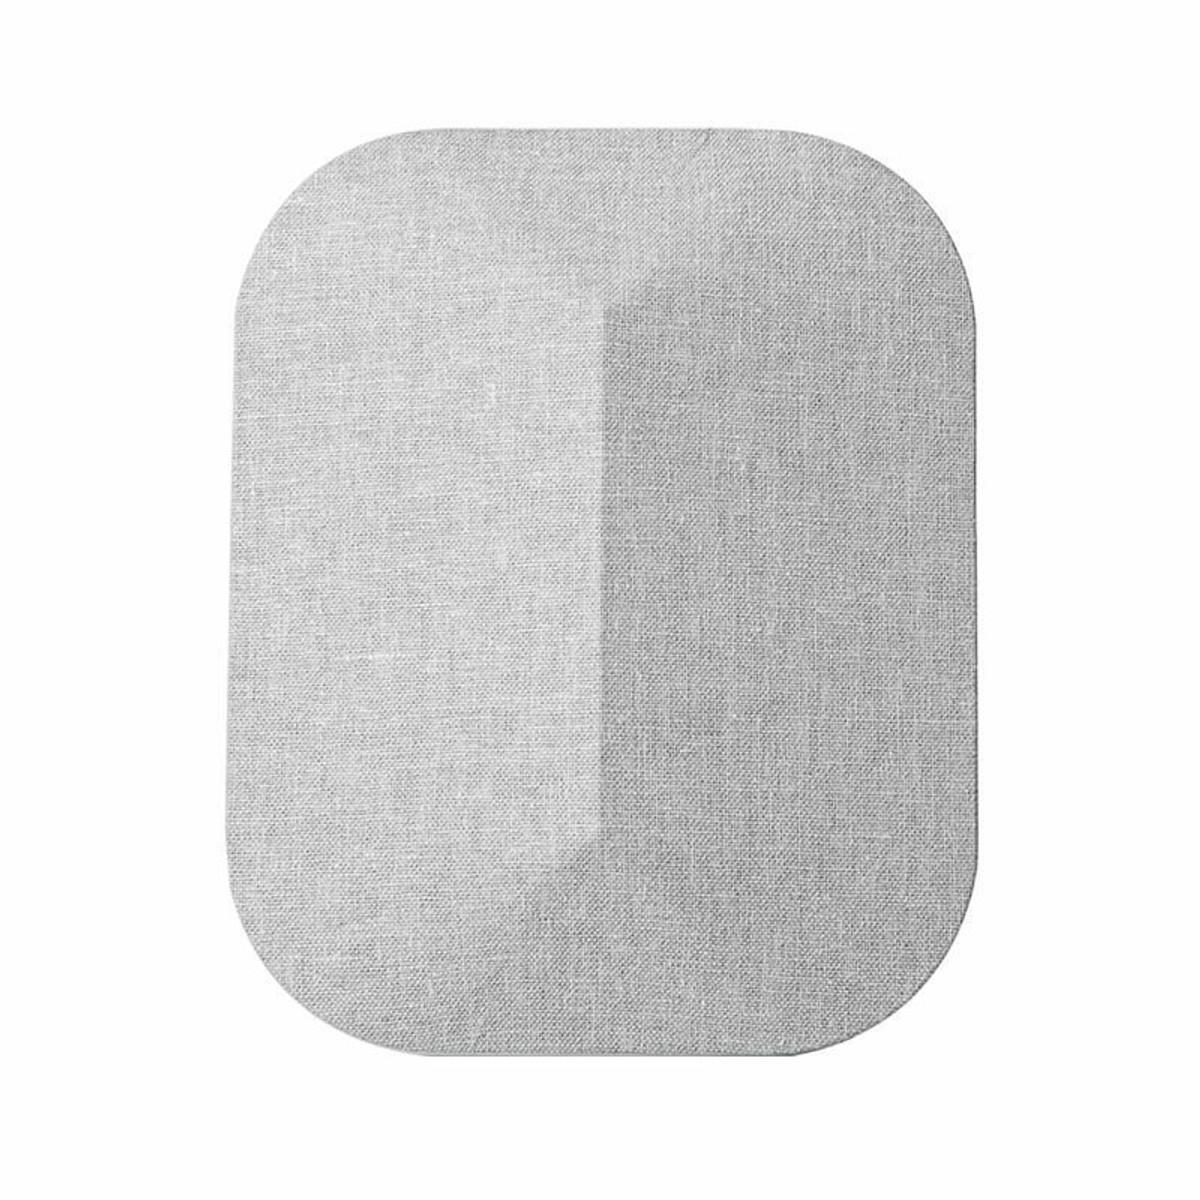 Wilson weBoost 314440 Home Fabric Inside Antenna, 75 Ohms